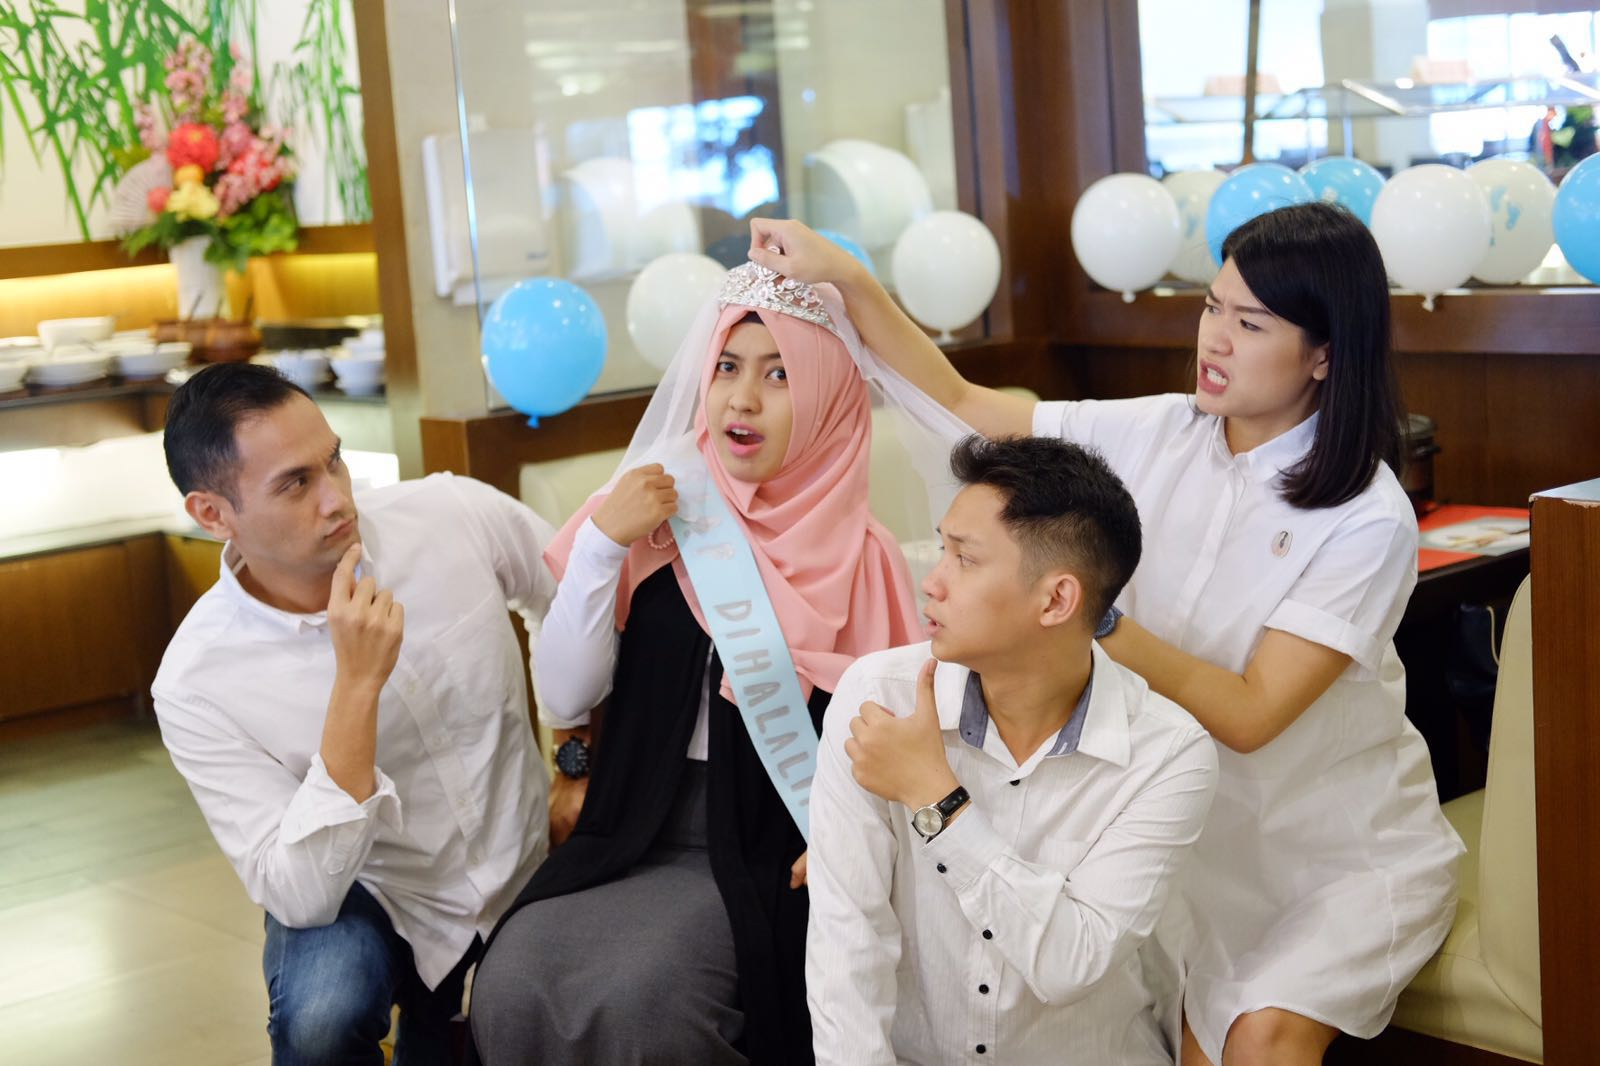 kejutan dari qbd team manis aneeetttt kayan tropicana slim dokumentasi peachy party organizer